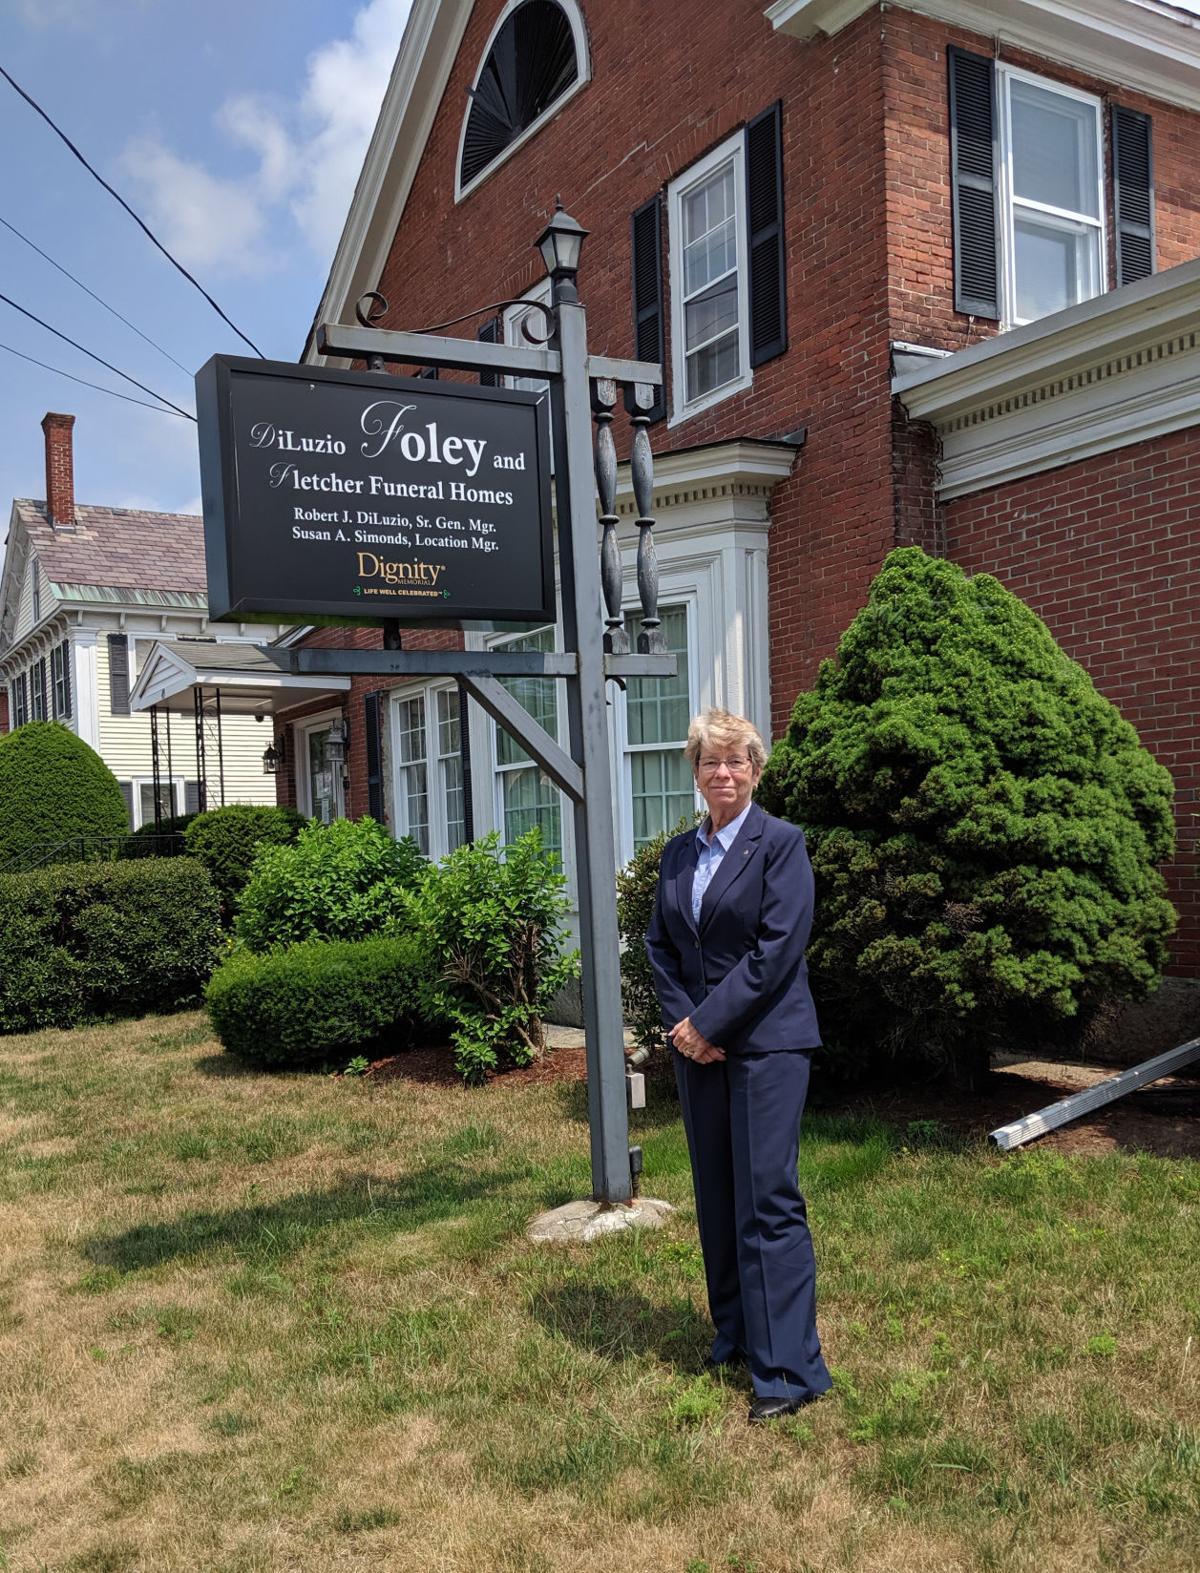 Outside Foley Funeral Home